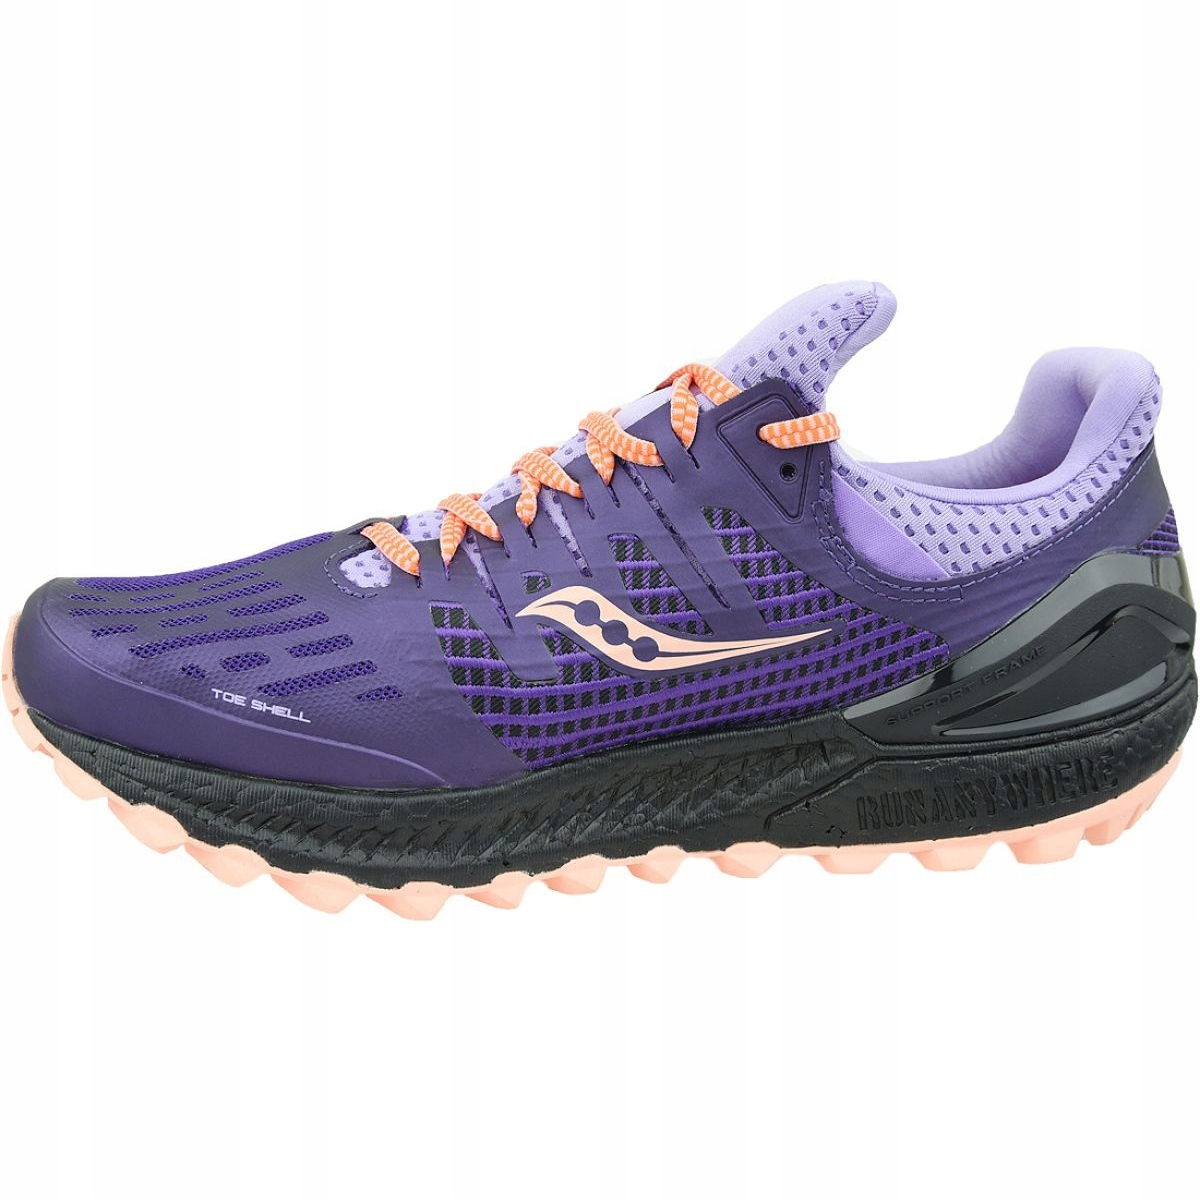 Saucony Saucony Triumph Iso 3 Running Shoe 8M Purple